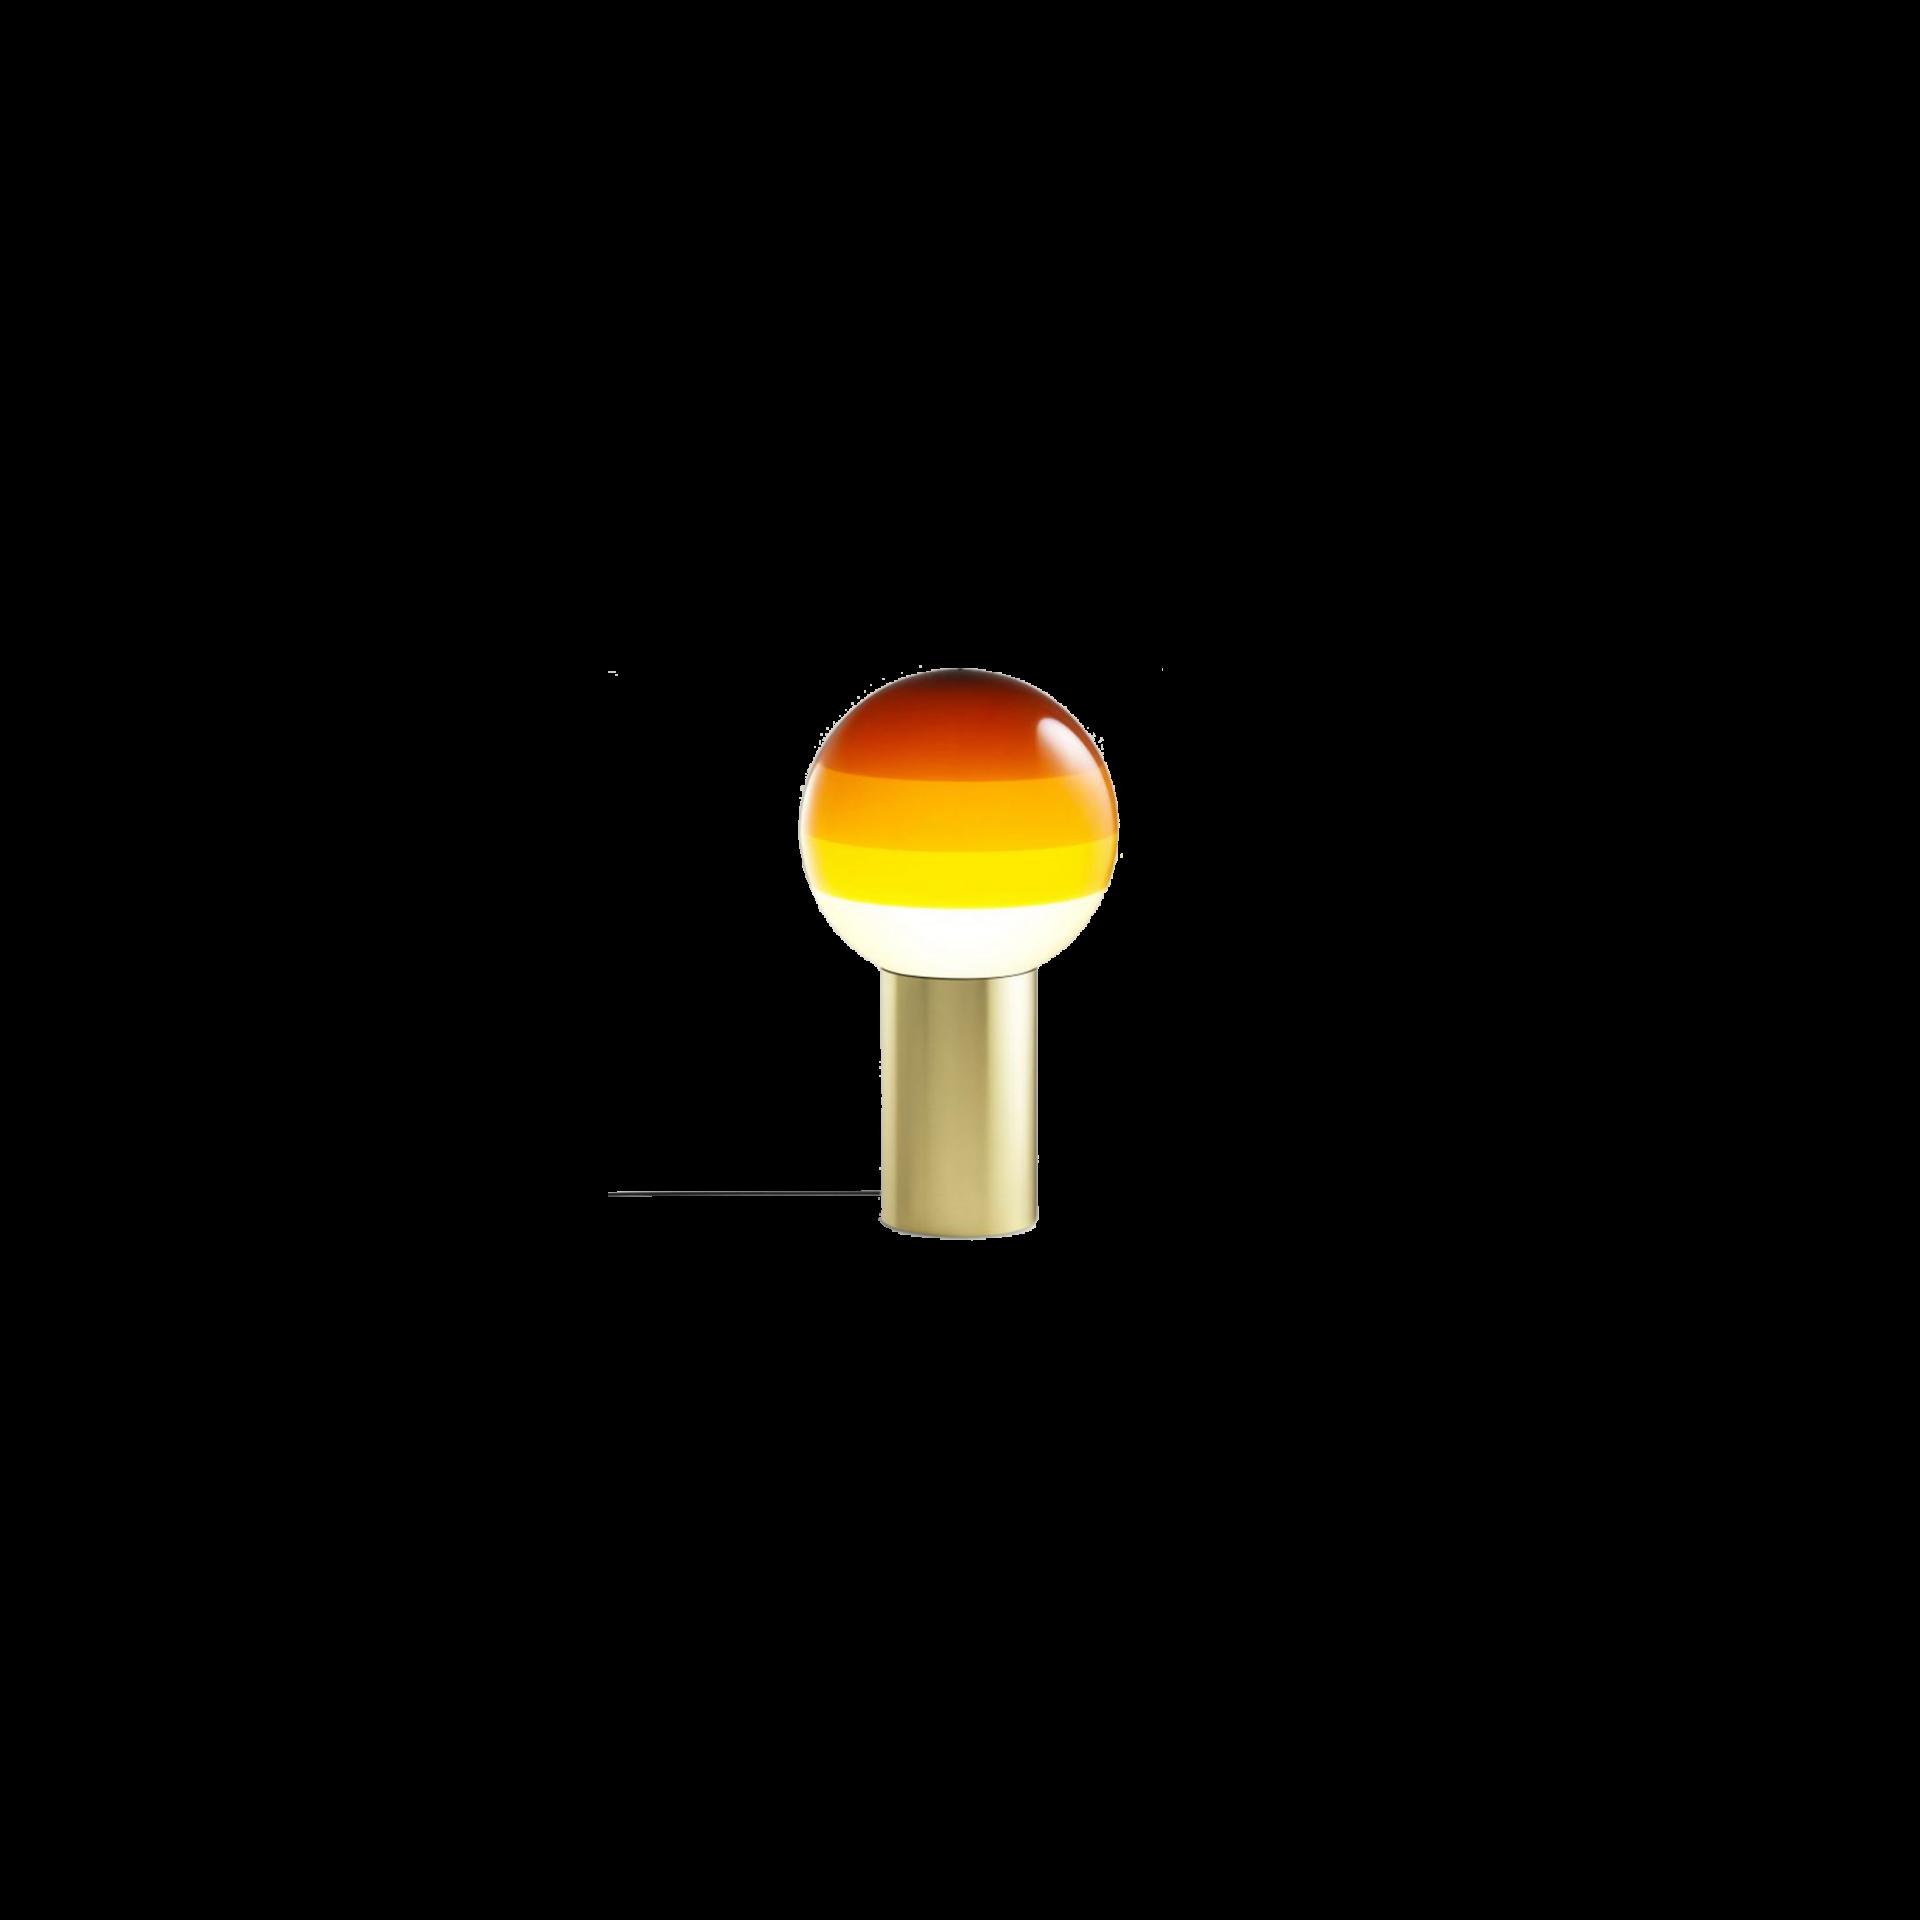 DIPPING LIGHT - Jordi Canudas, 2018, Marset